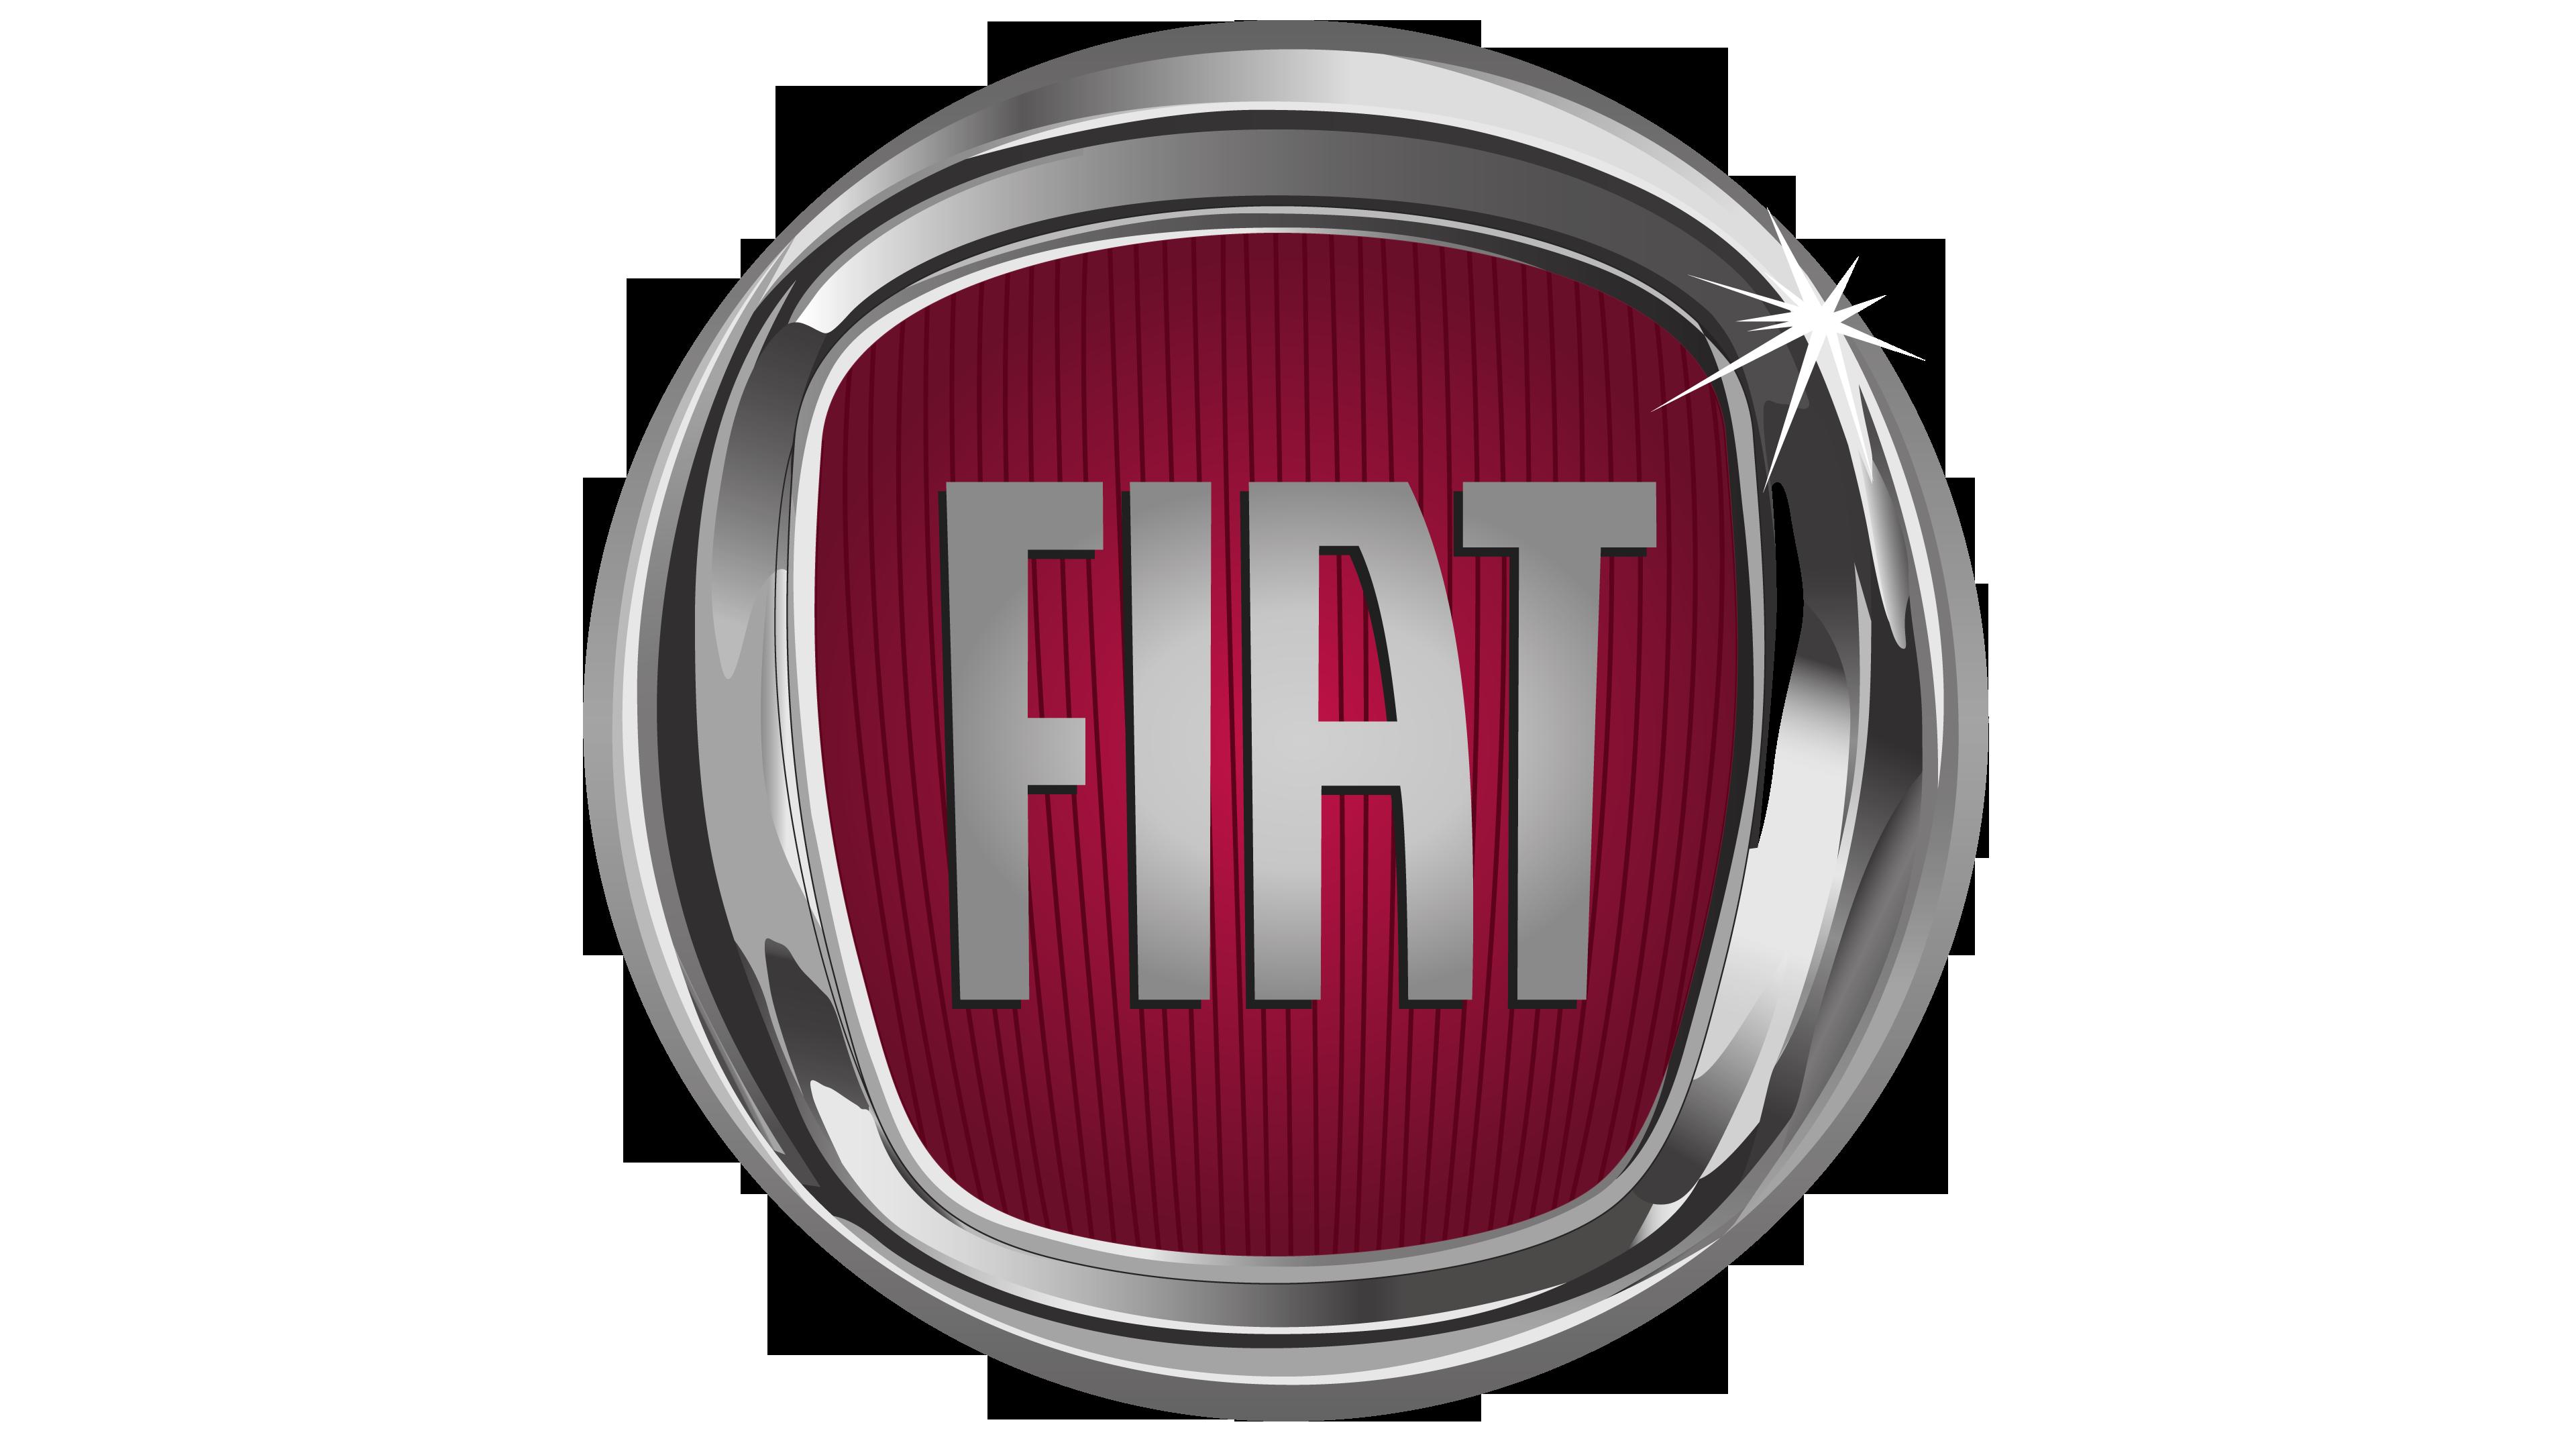 Fiat logo Bedeutung [ZEICHEN logo, png].